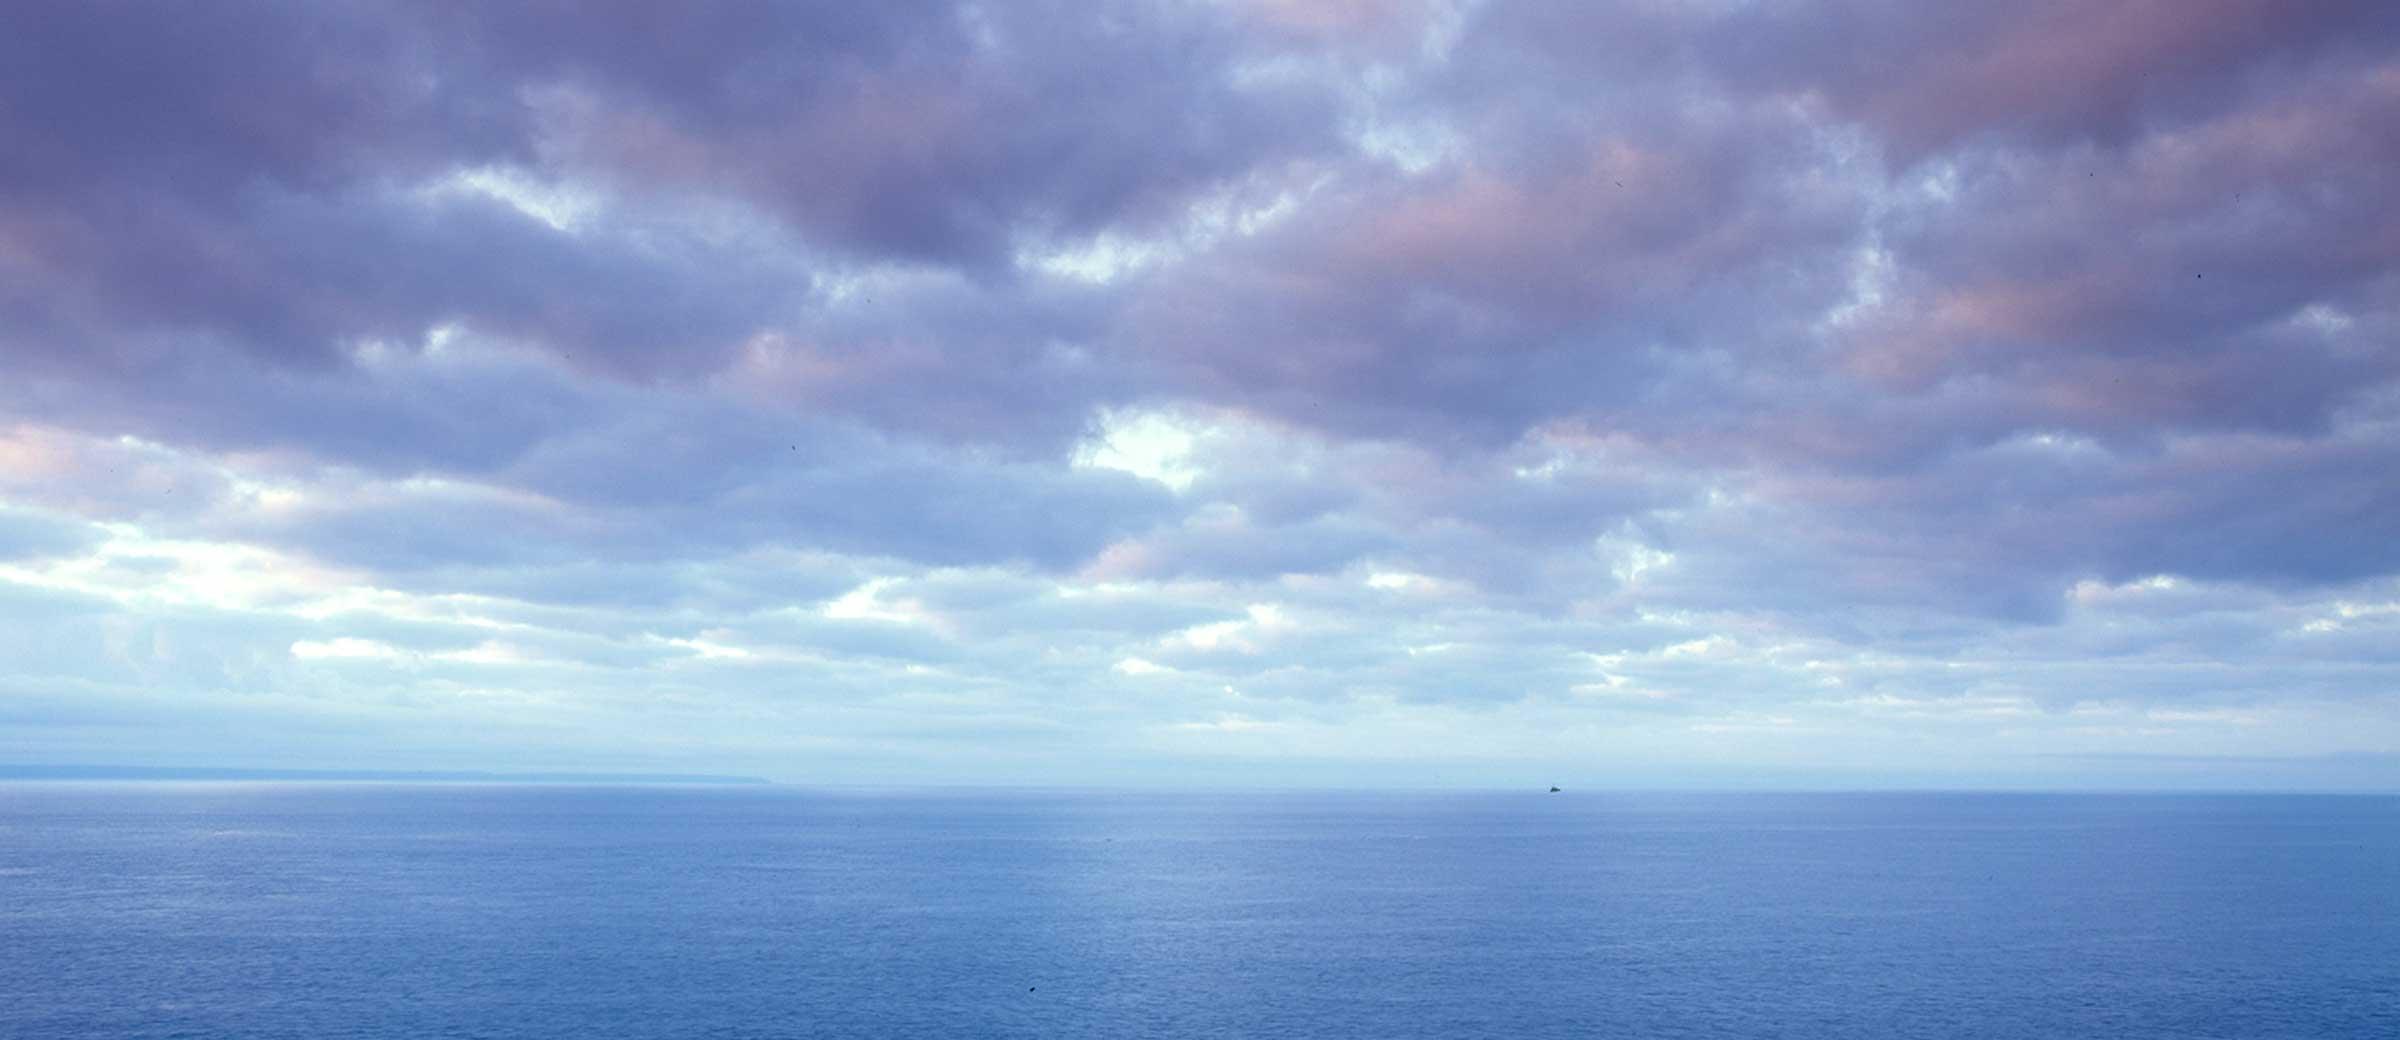 mcht-Sea_and_Clouds_The_Bold_Coast_Boot_Cove_Trescott_Maine_-_2000_-_Sara_Gray-hero